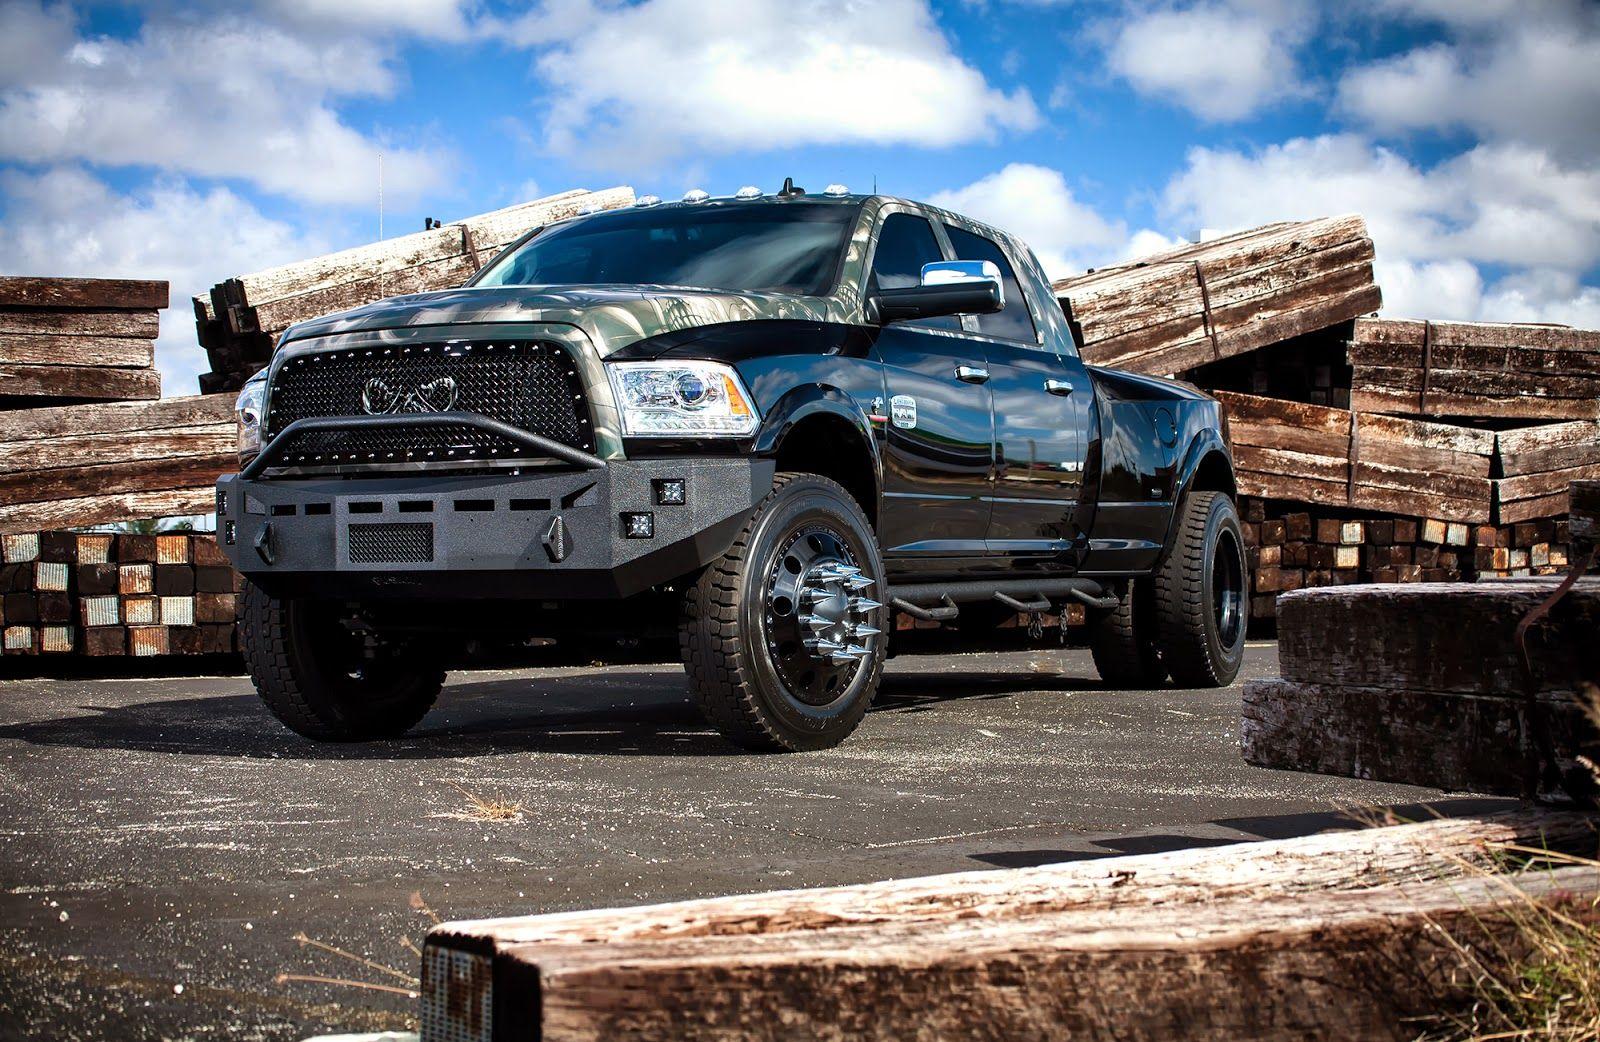 diesel truck wallpaper  Lifted Trucks Wallpapers and Images Desktop Nexus Groups 1600×1200 ...